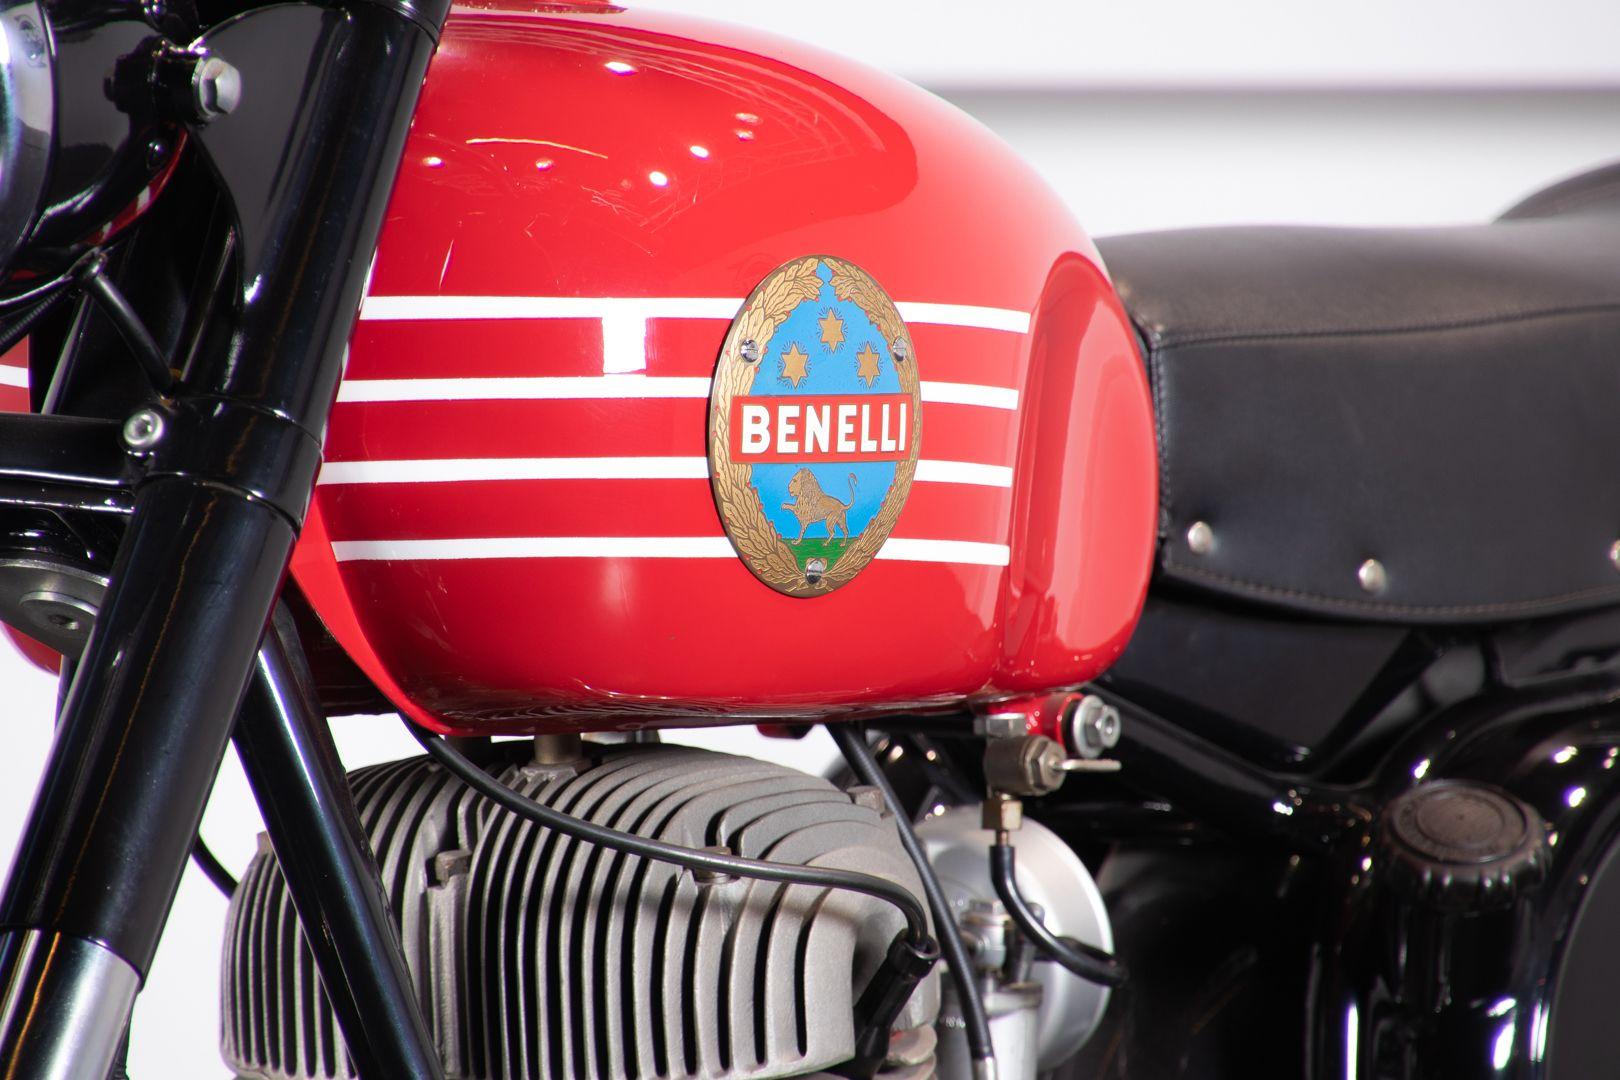 1955 Benelli 250 Leonessa 74318